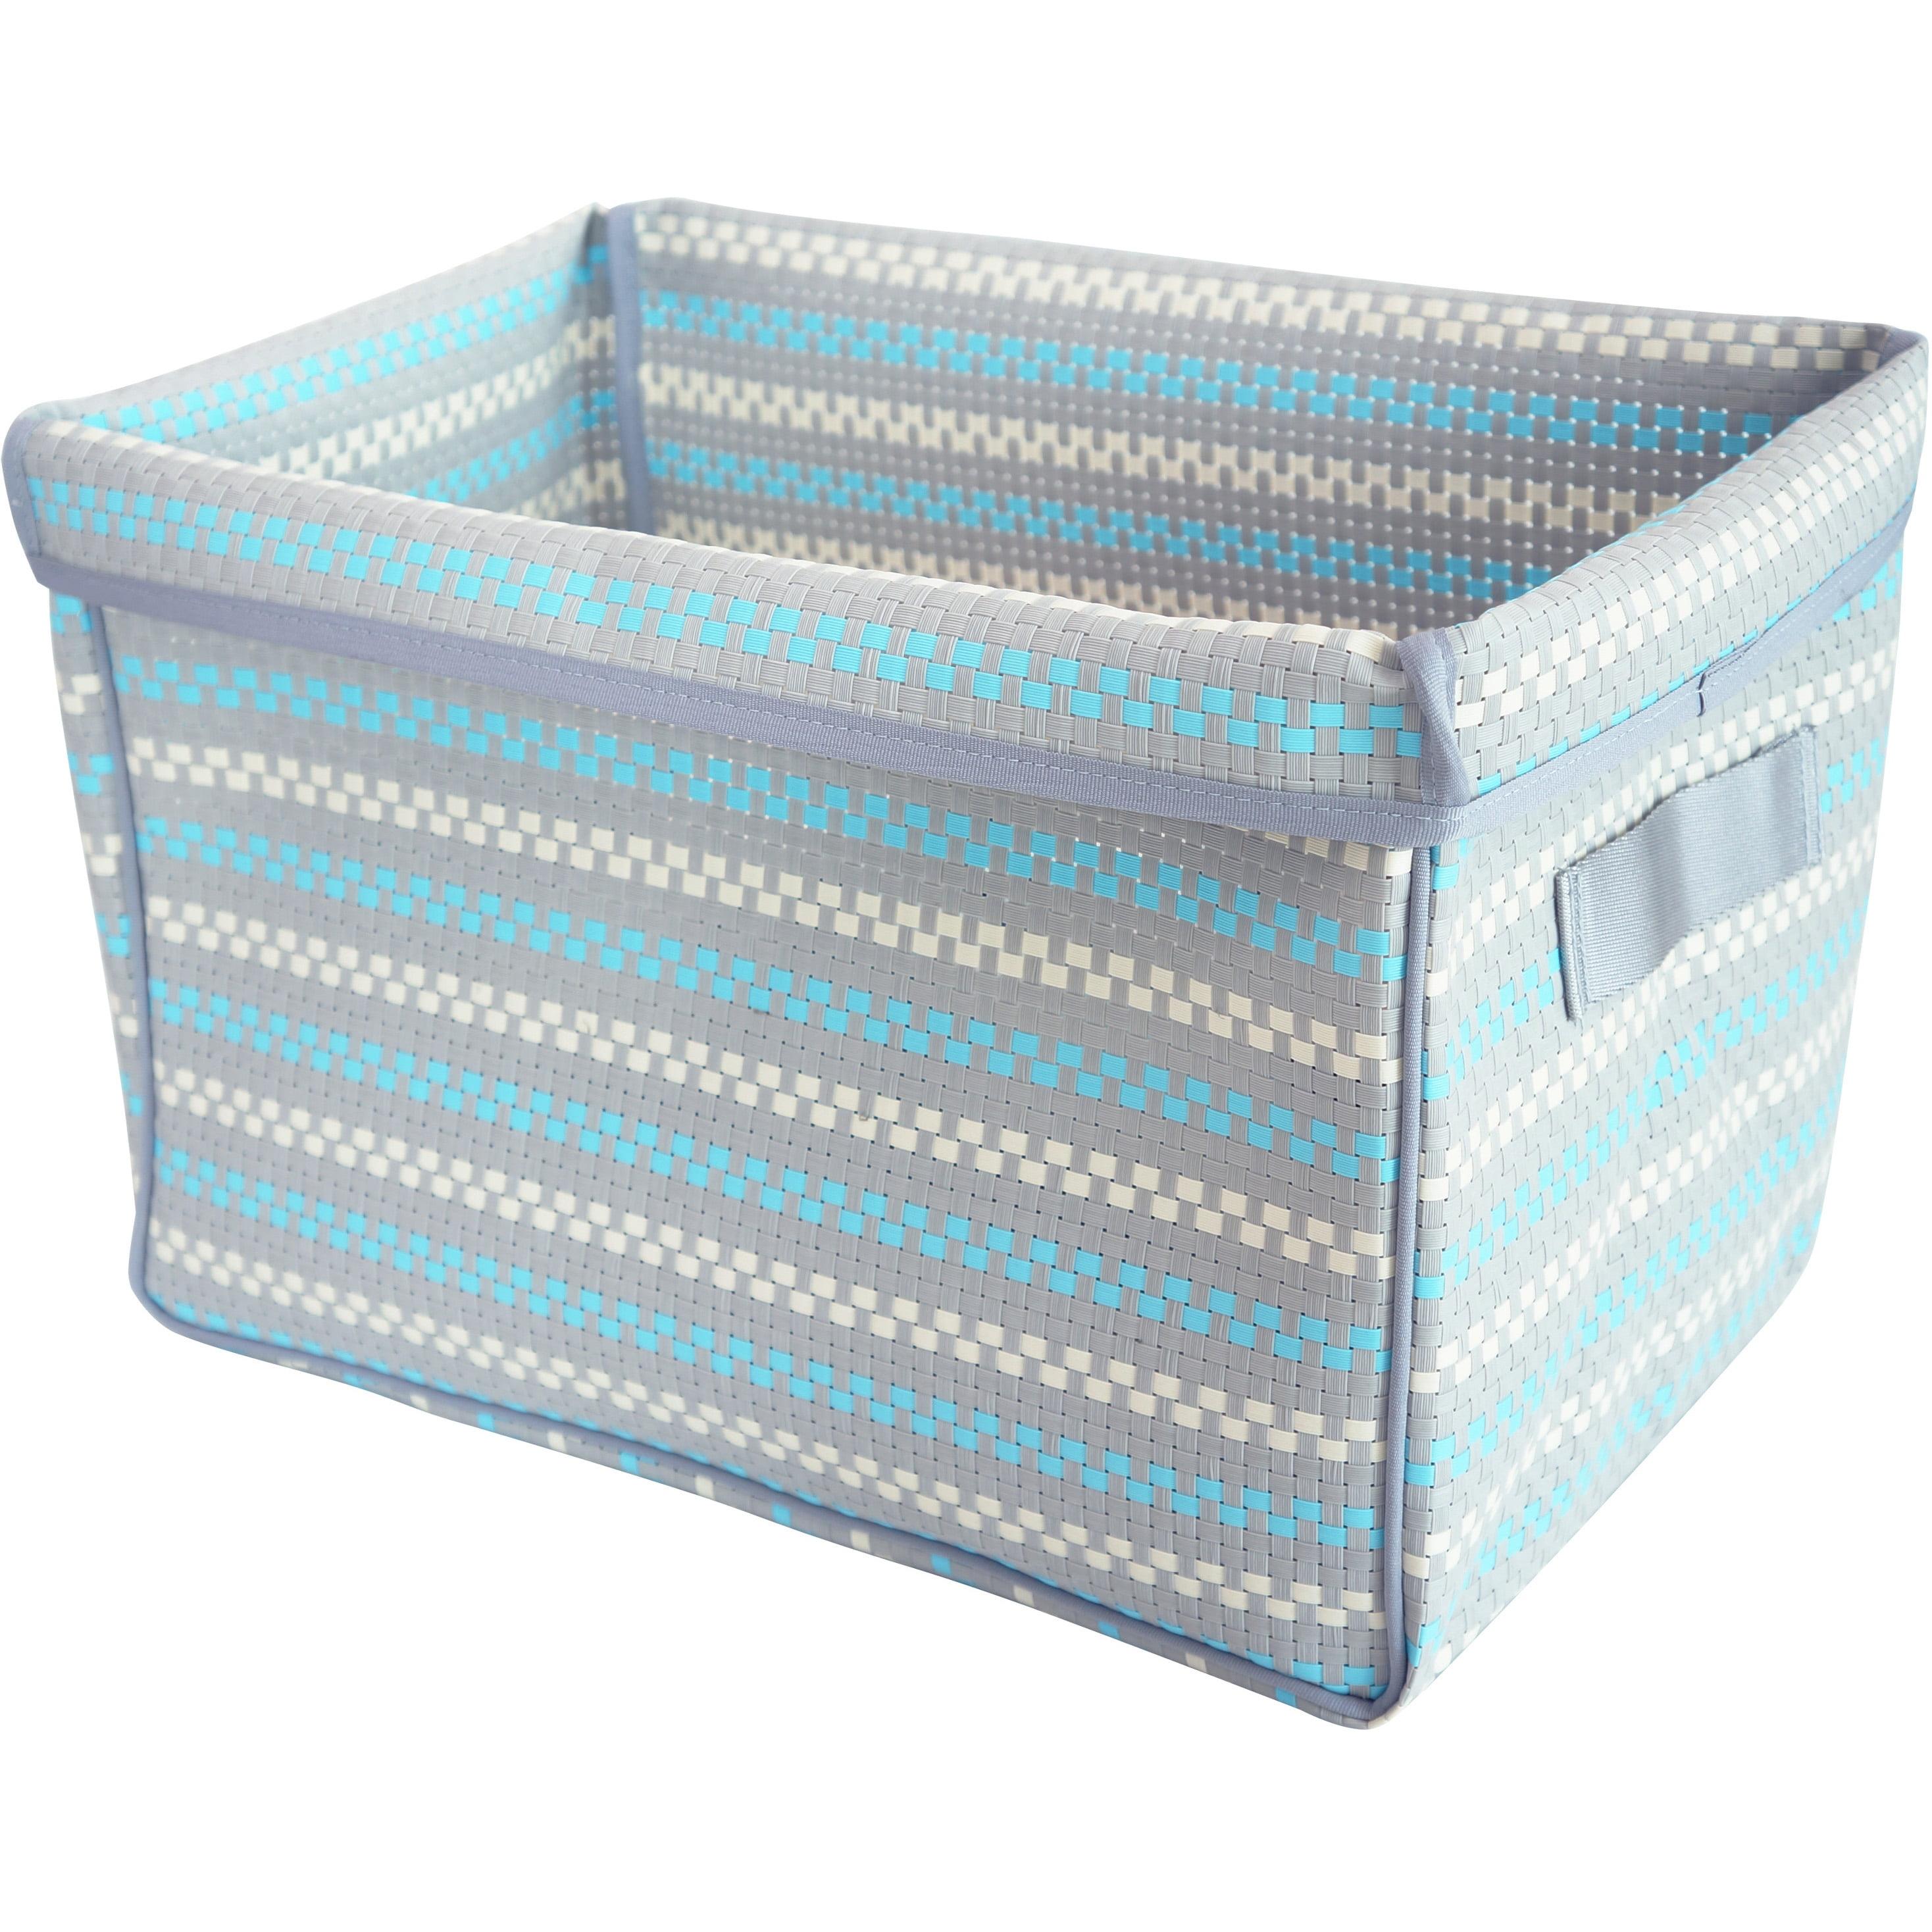 Pivoine Foldable Storage Basket, Mosaic Gray and Sky Blue